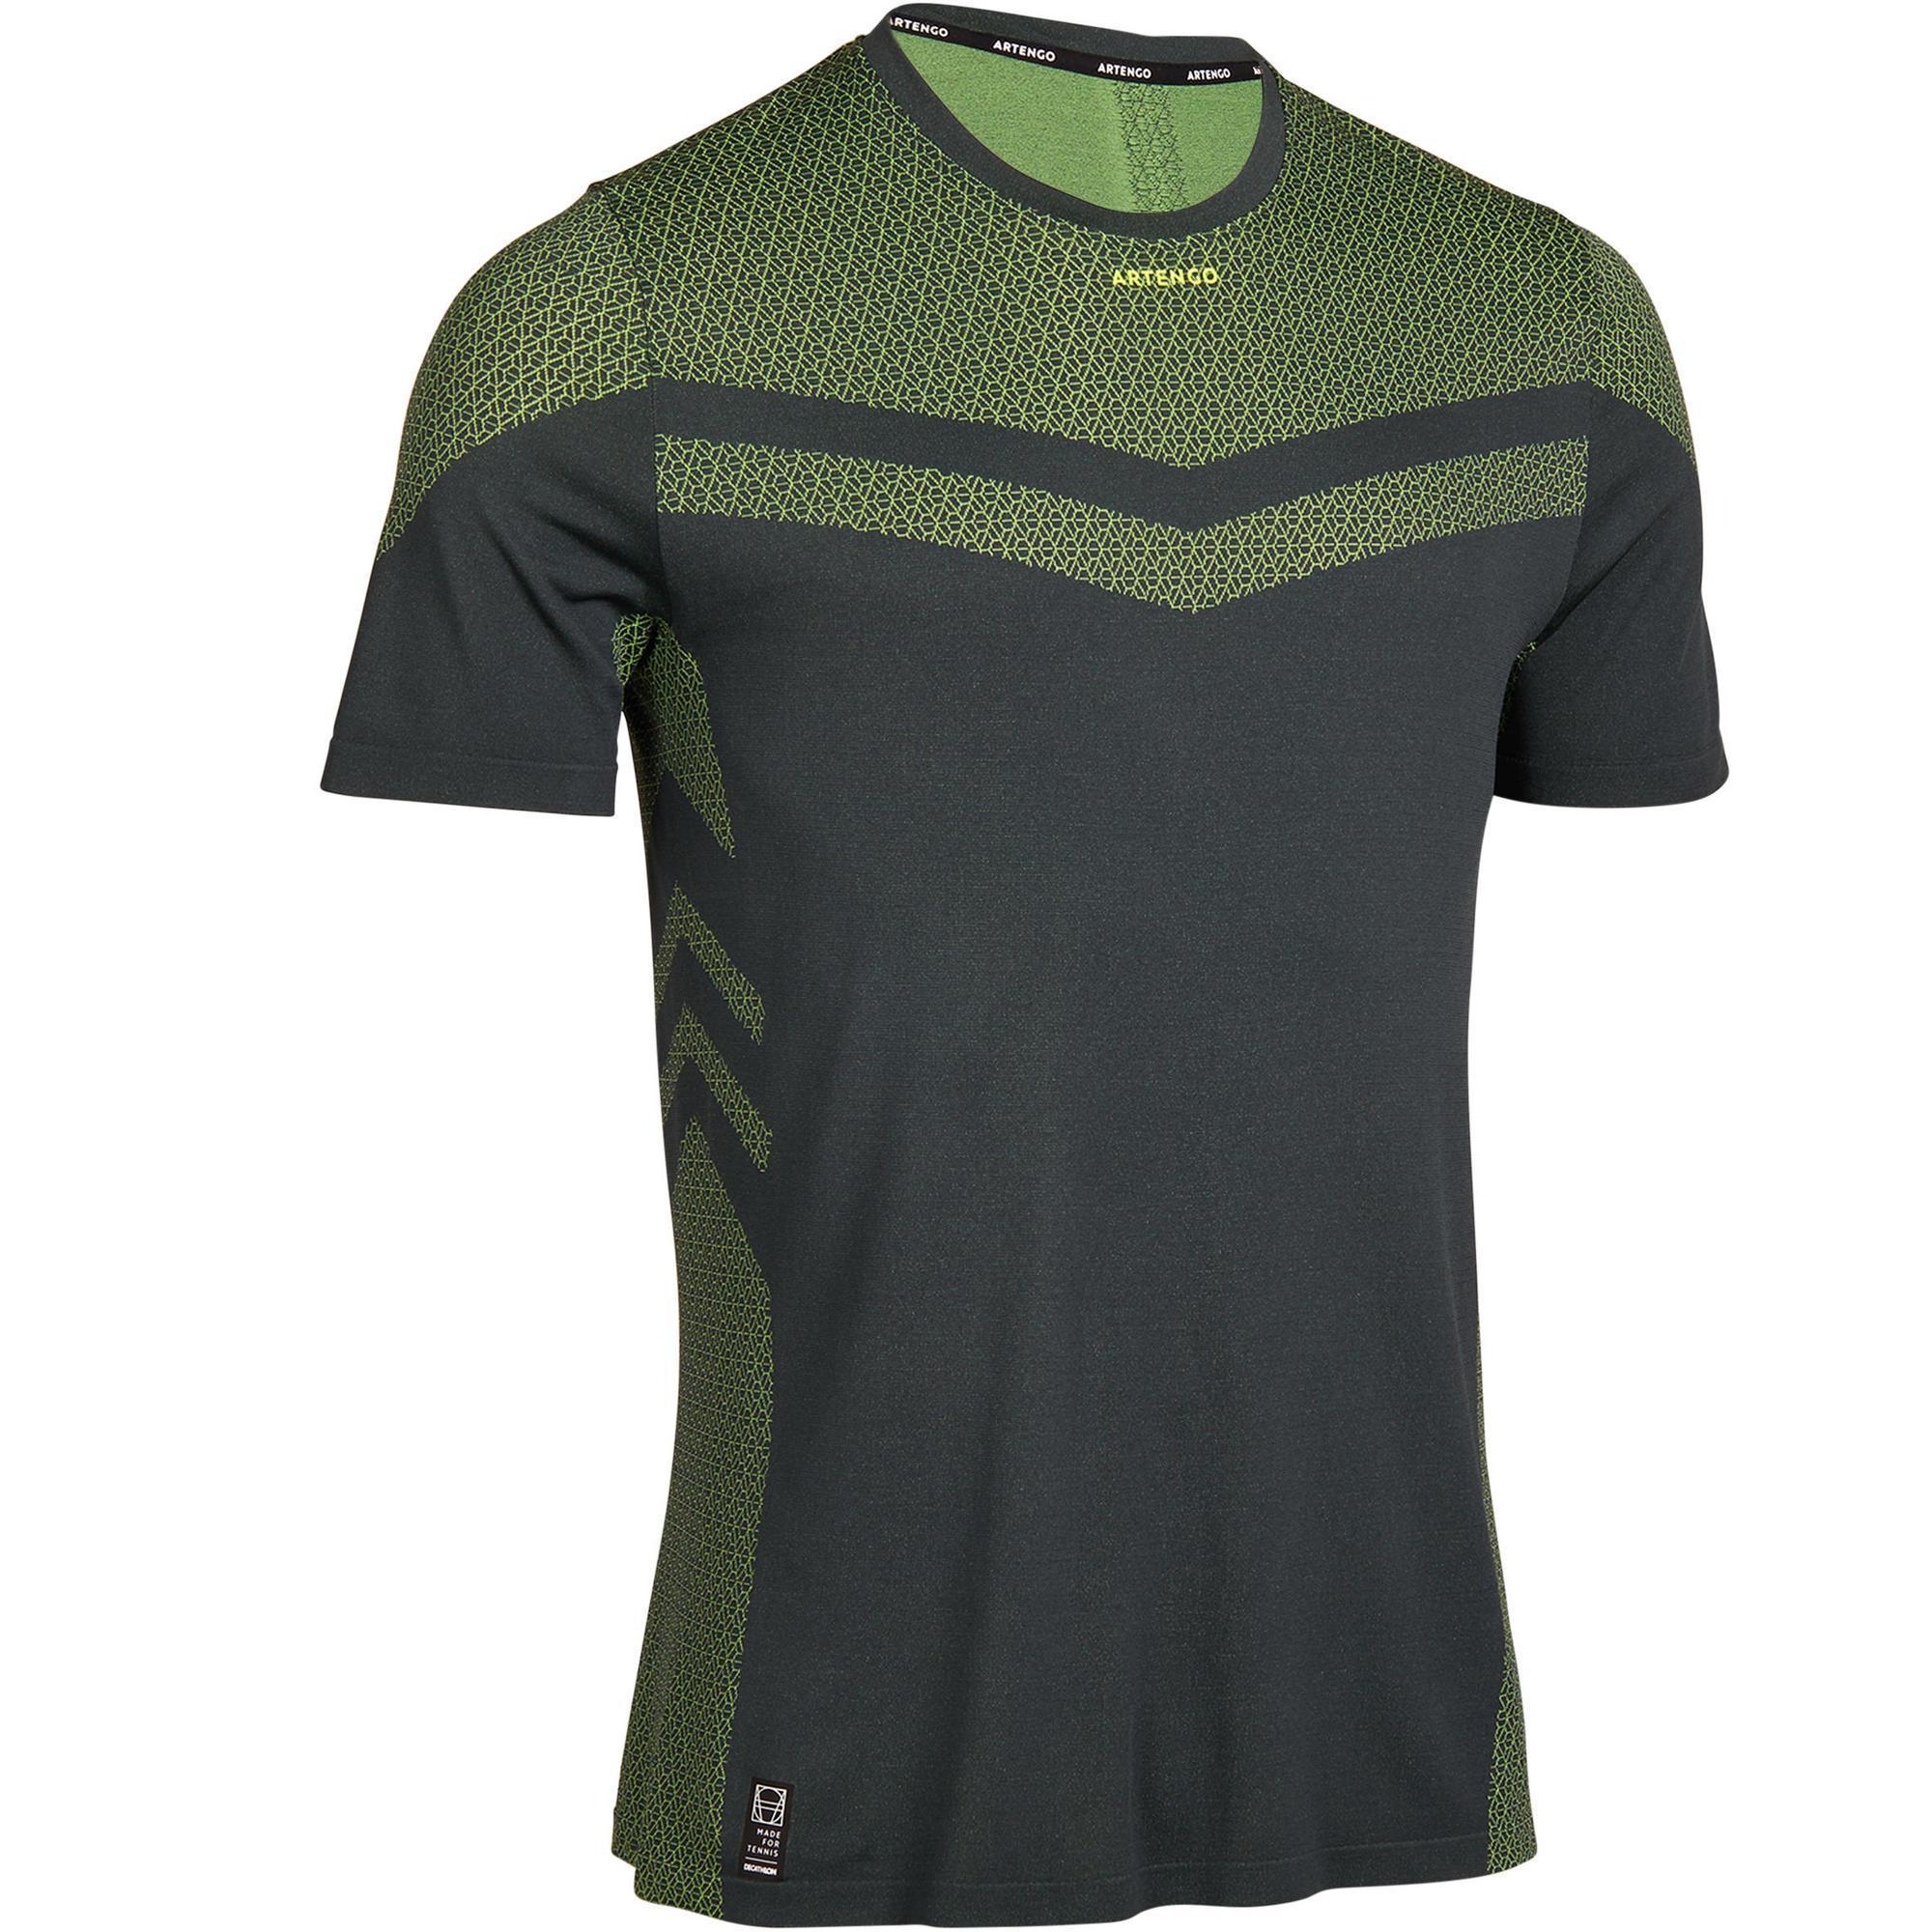 Artengo T-shirt tennis Light 990 heren kaki